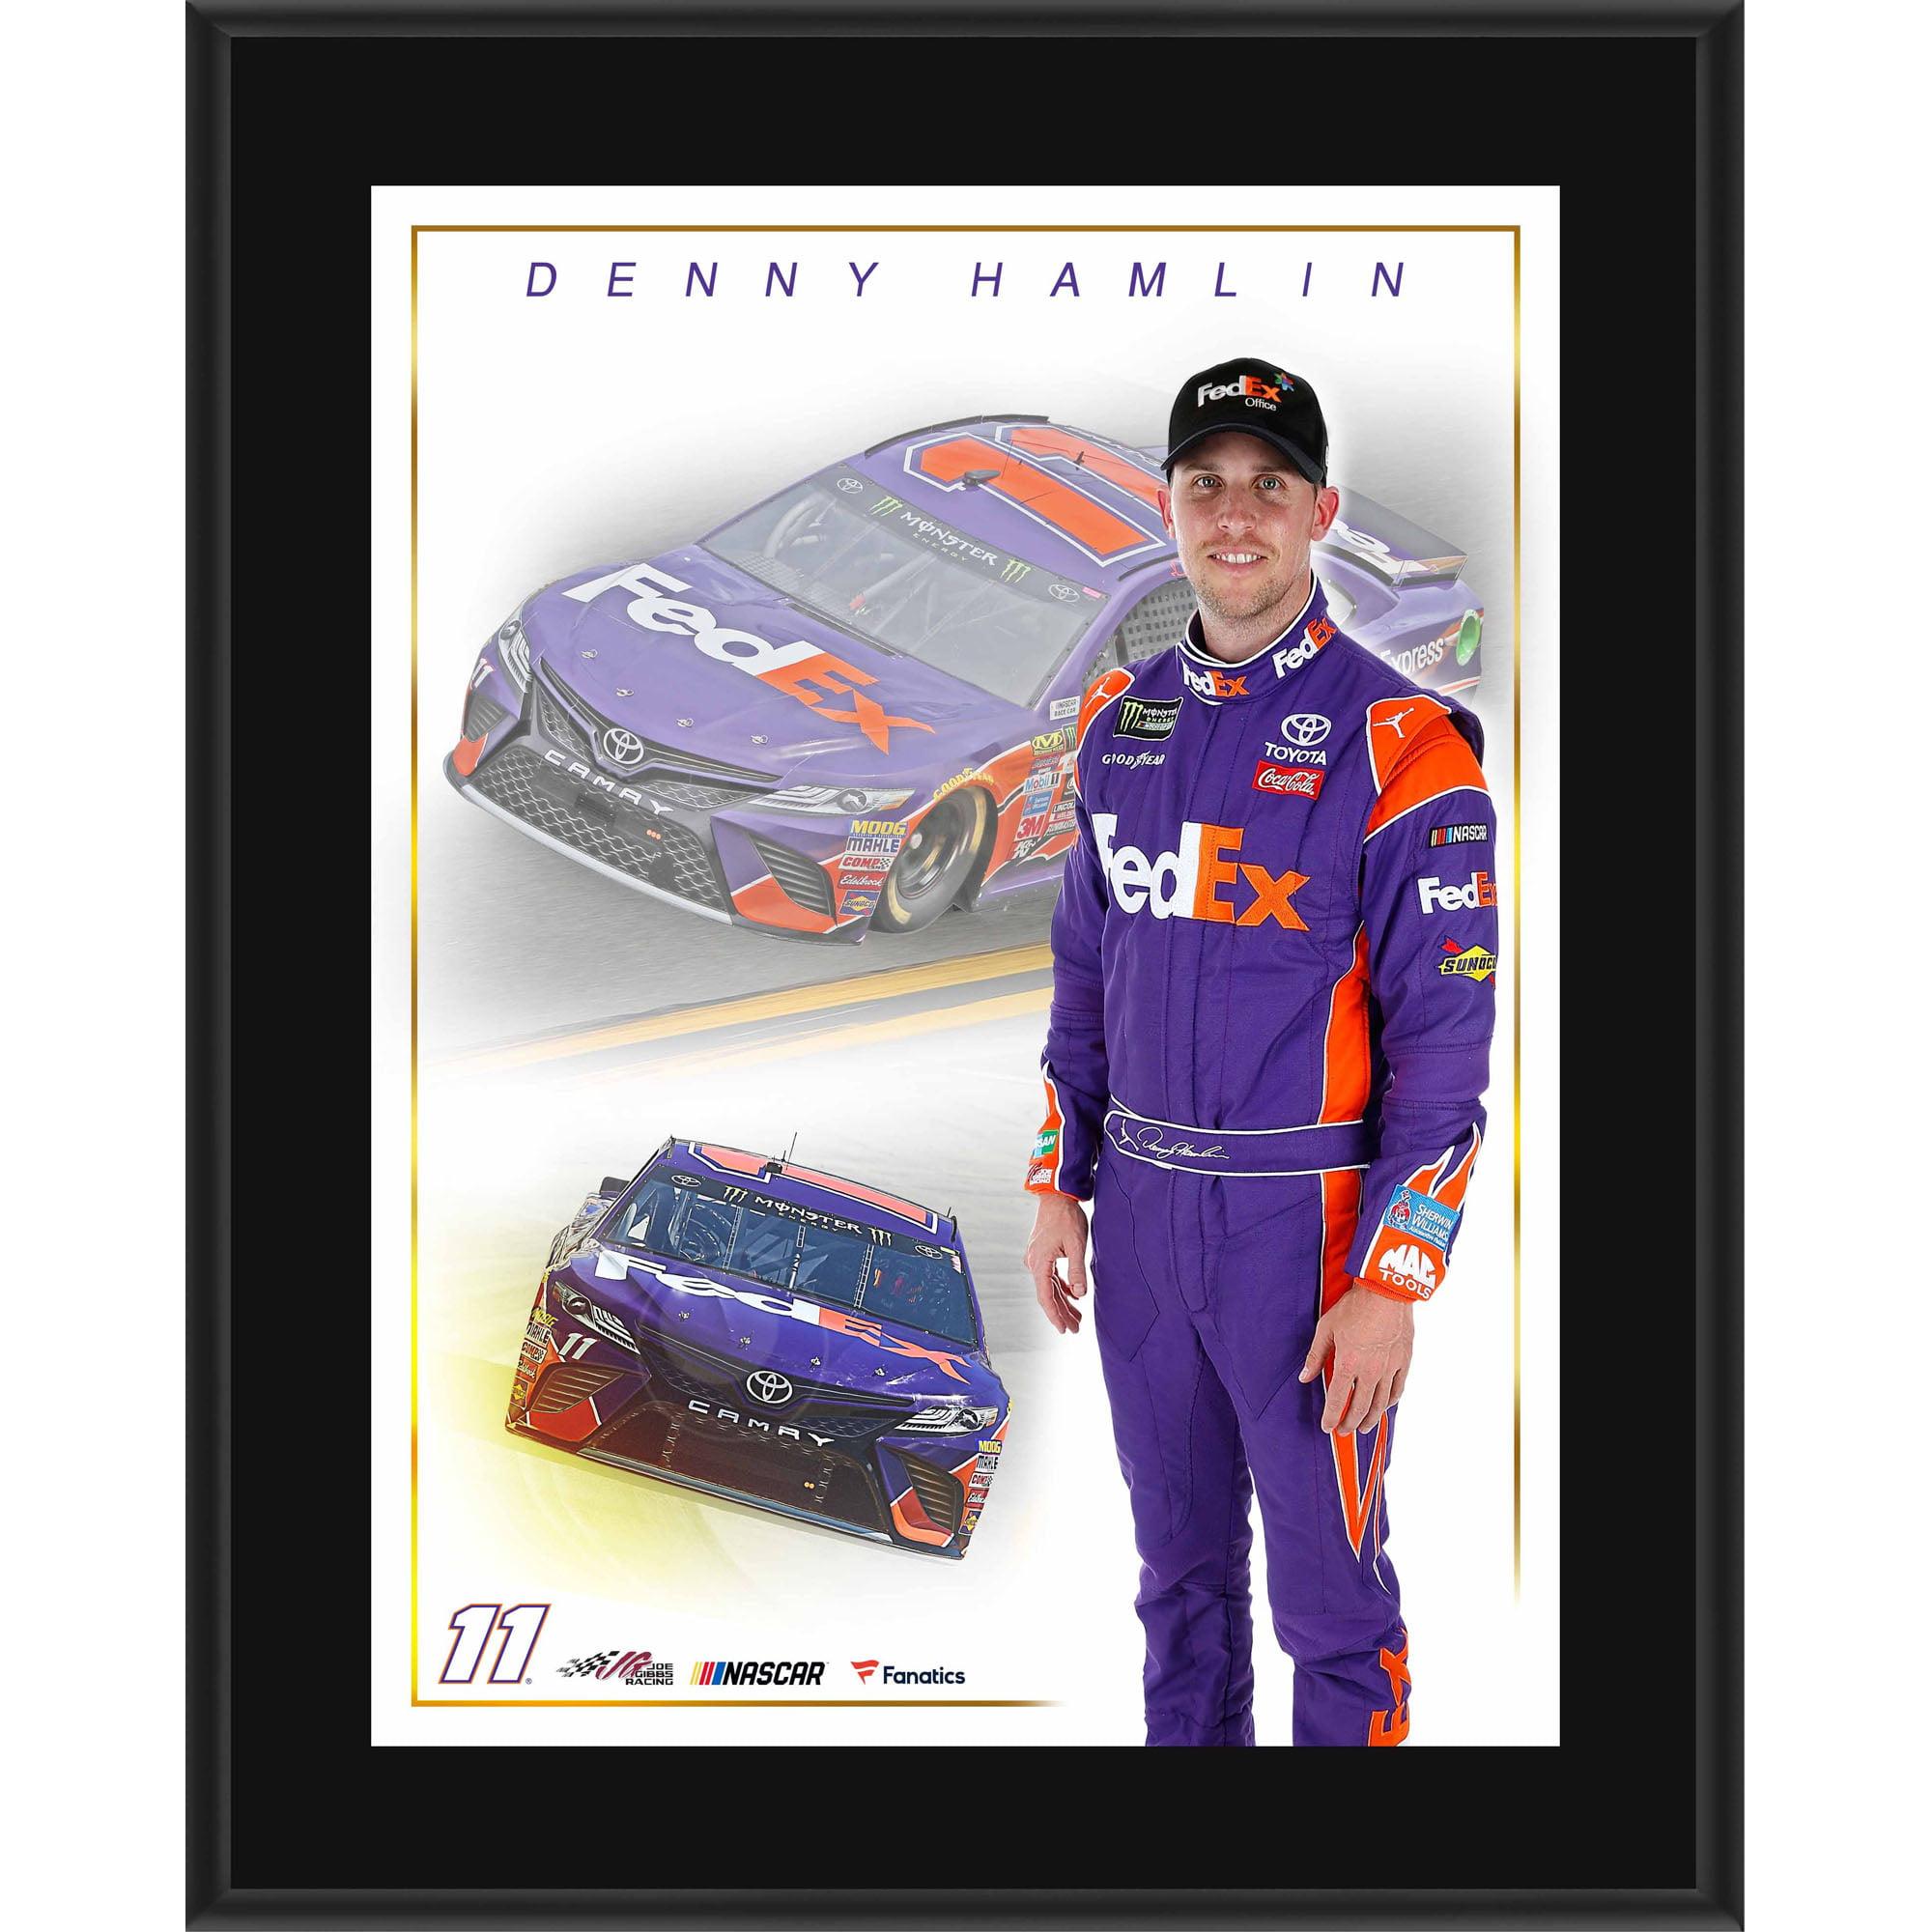 "Denny Hamlin Fanatics Authentic 10.5"" x 13"" FedEx Sublimated Plaque - No Size"